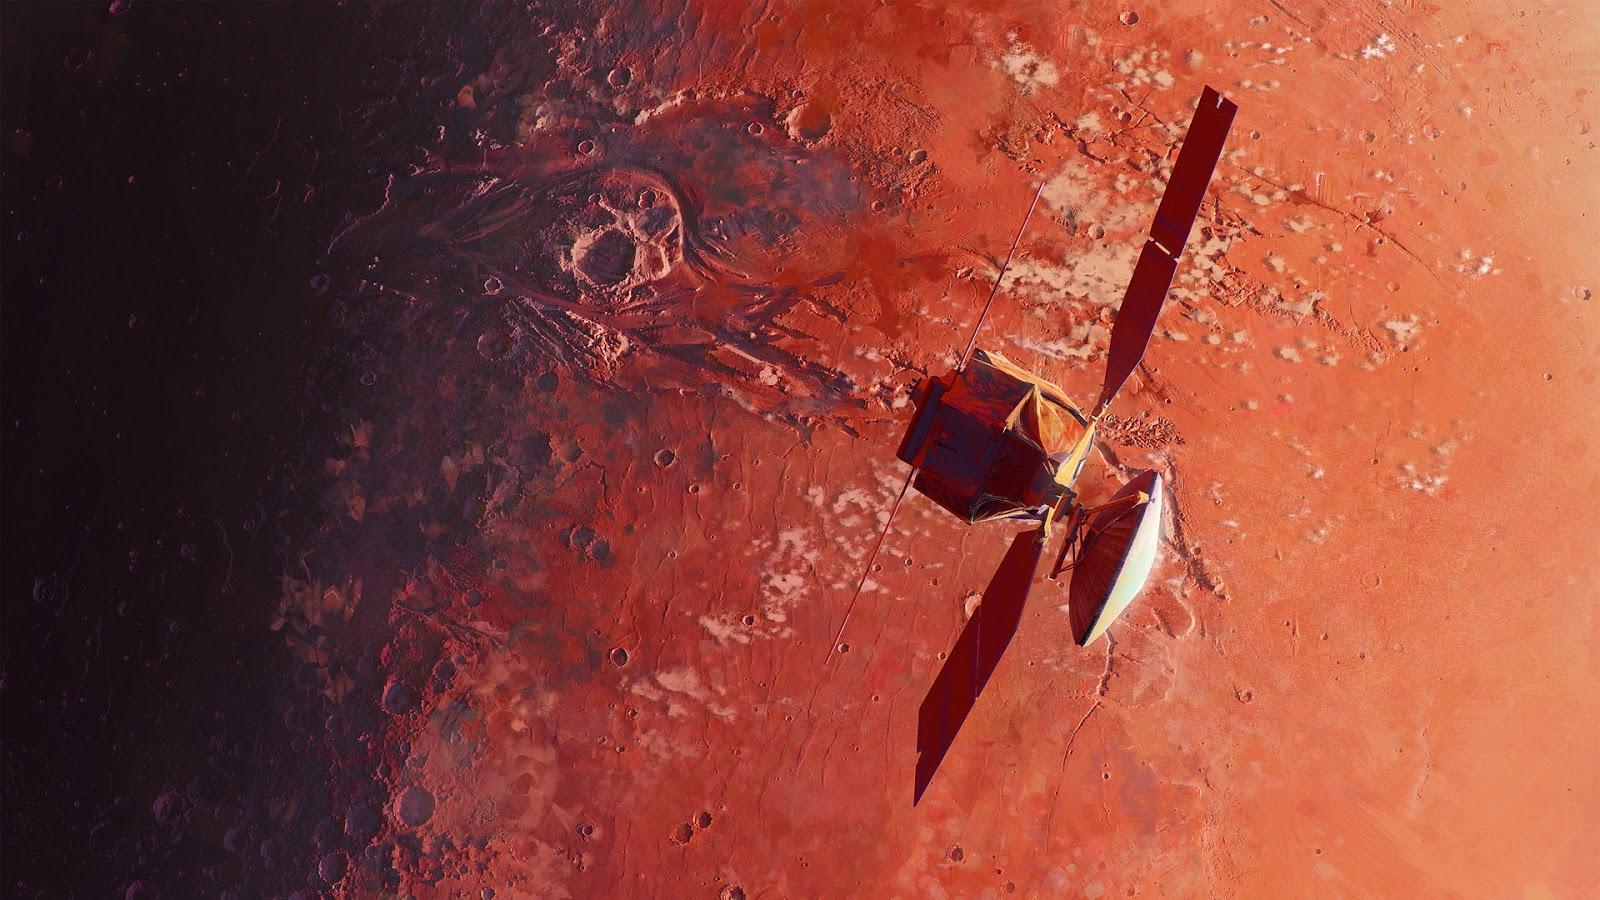 Mars Reconnaissance Orbiter illustration in 1920 x 1080 pixels